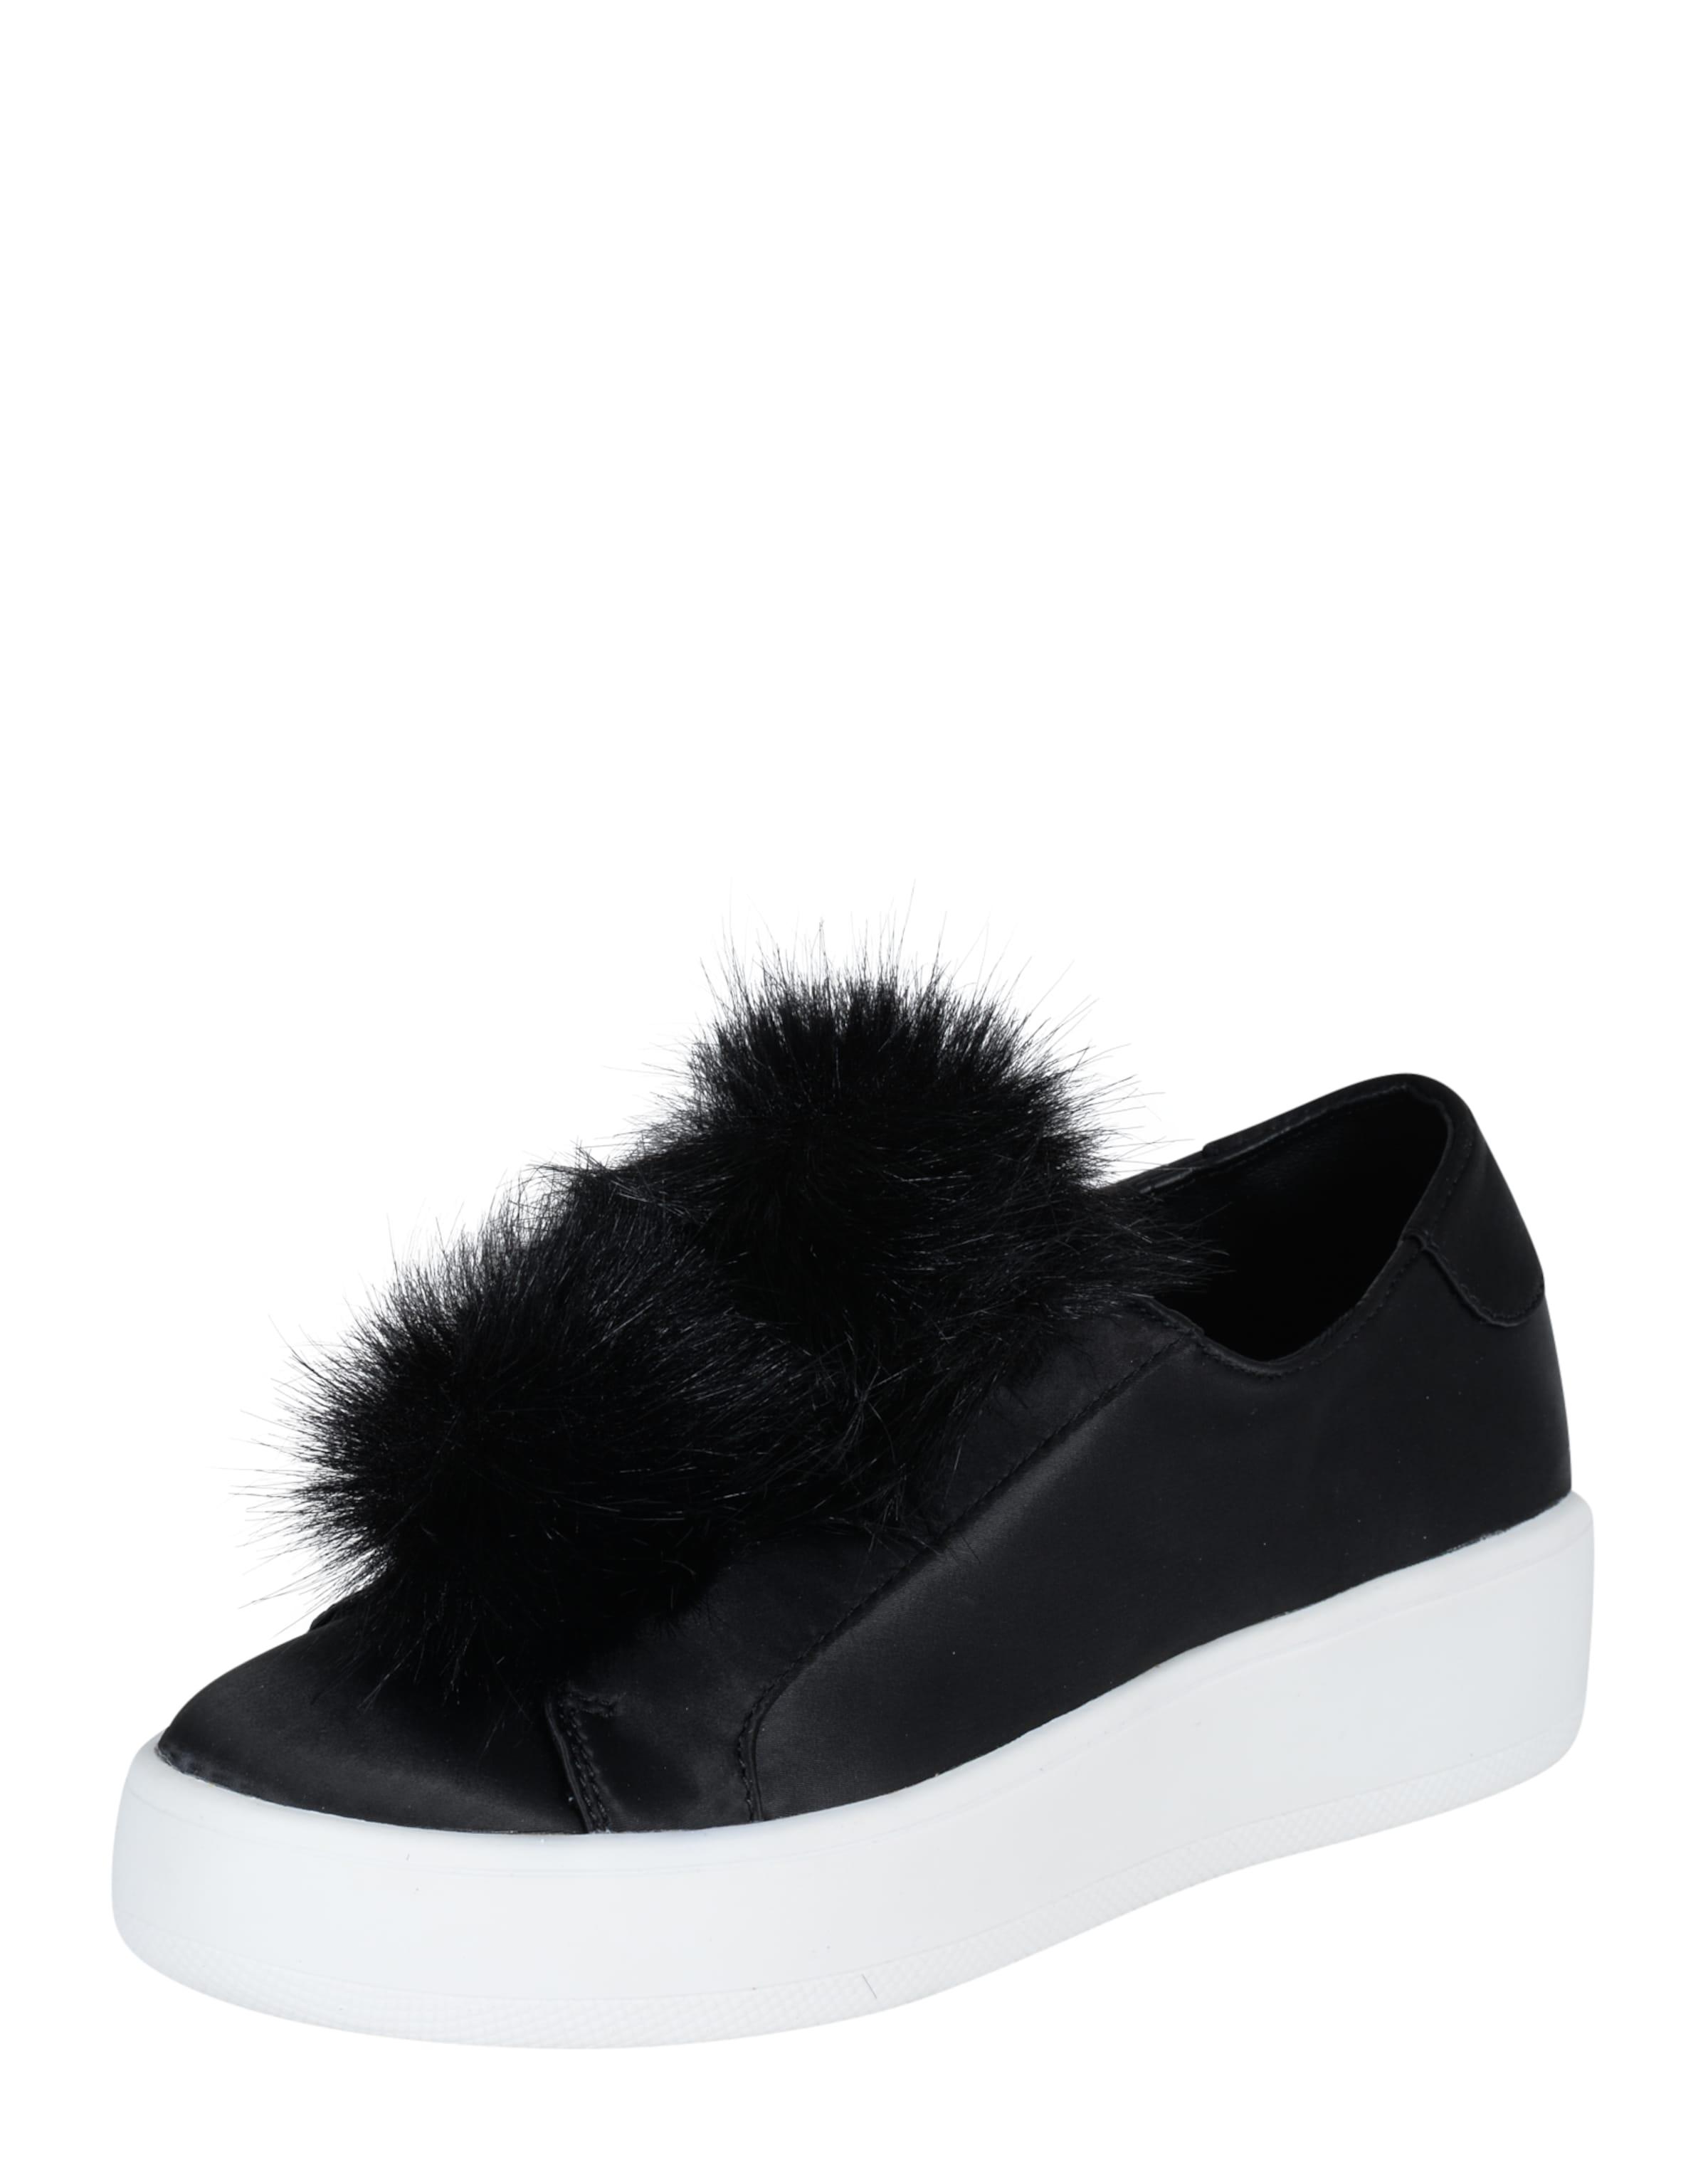 STEVE MADDEN Sneaker Breeze Verschleißfeste billige Schuhe